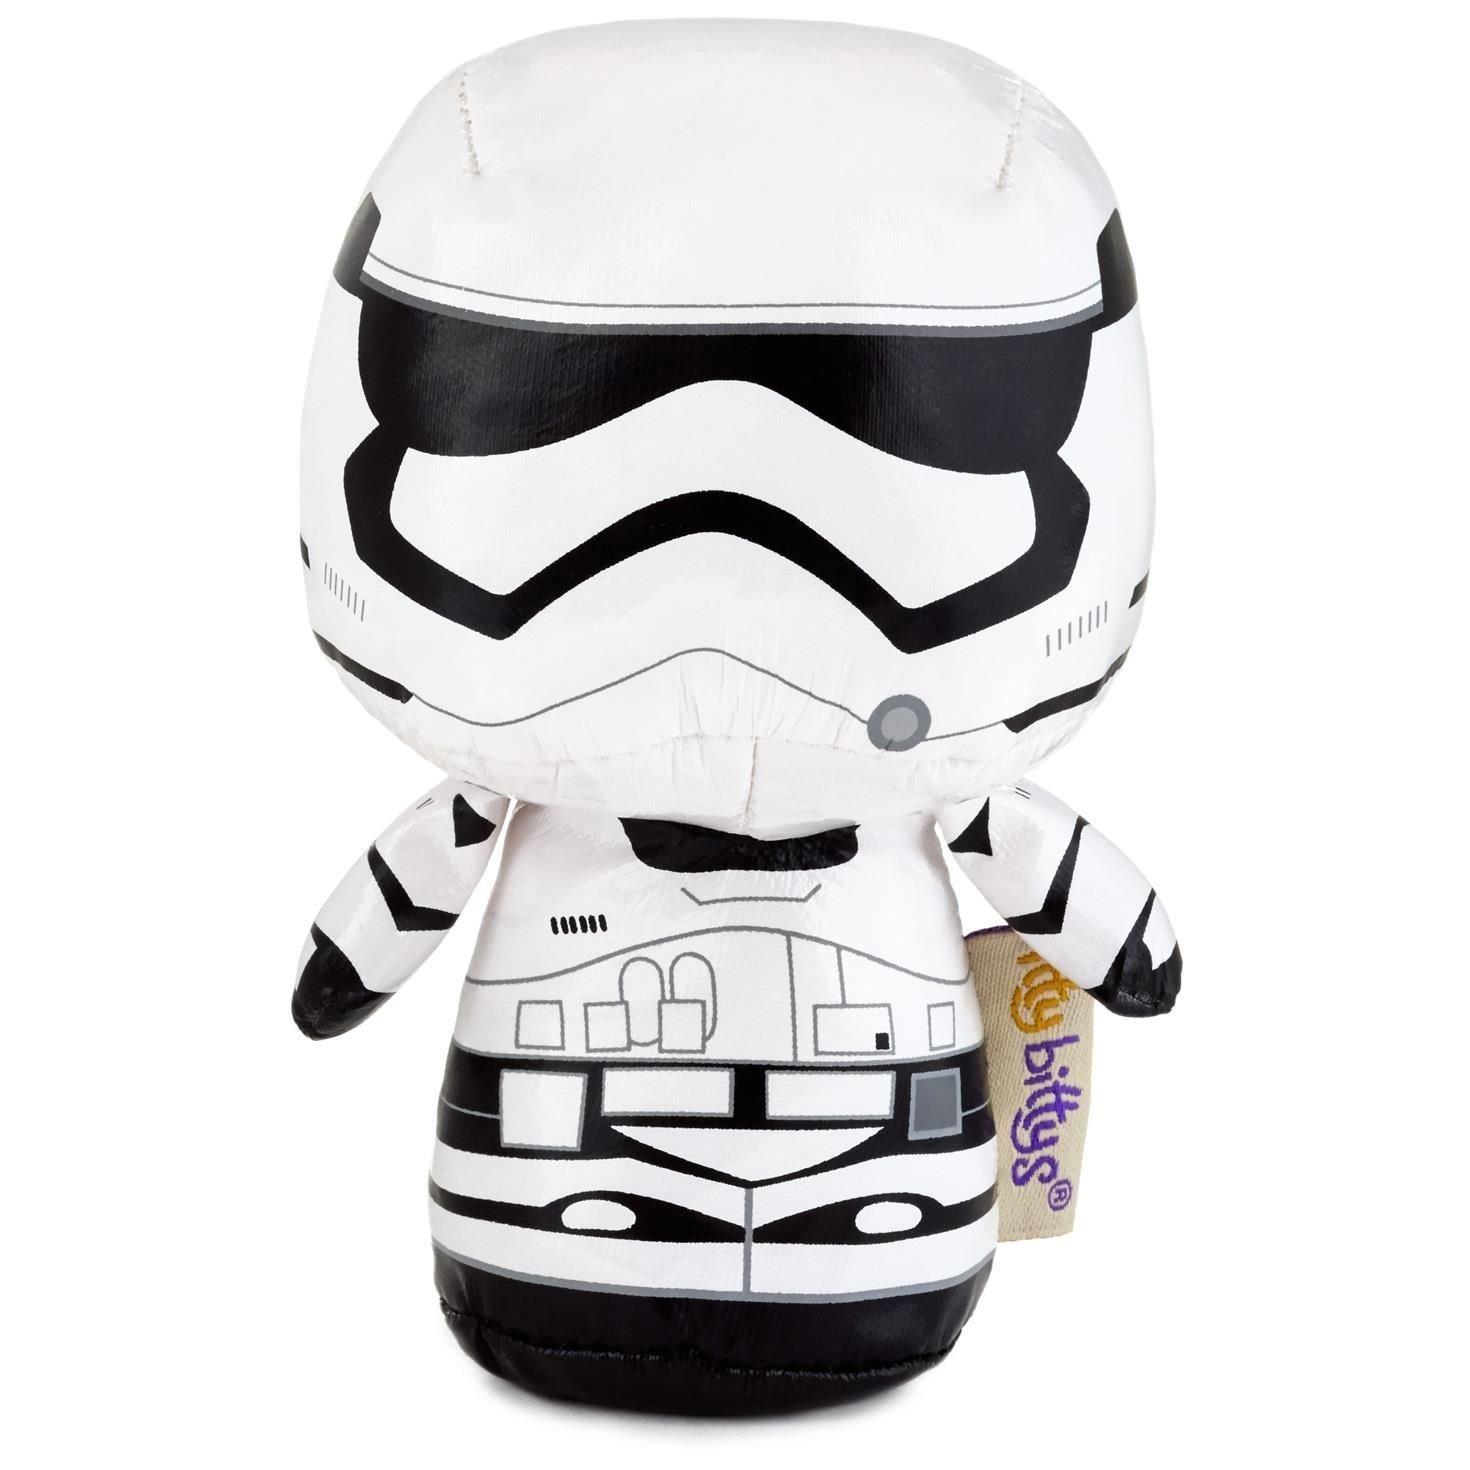 TLJ FO Stormtrooper Itty Bittys Plush Toy 1